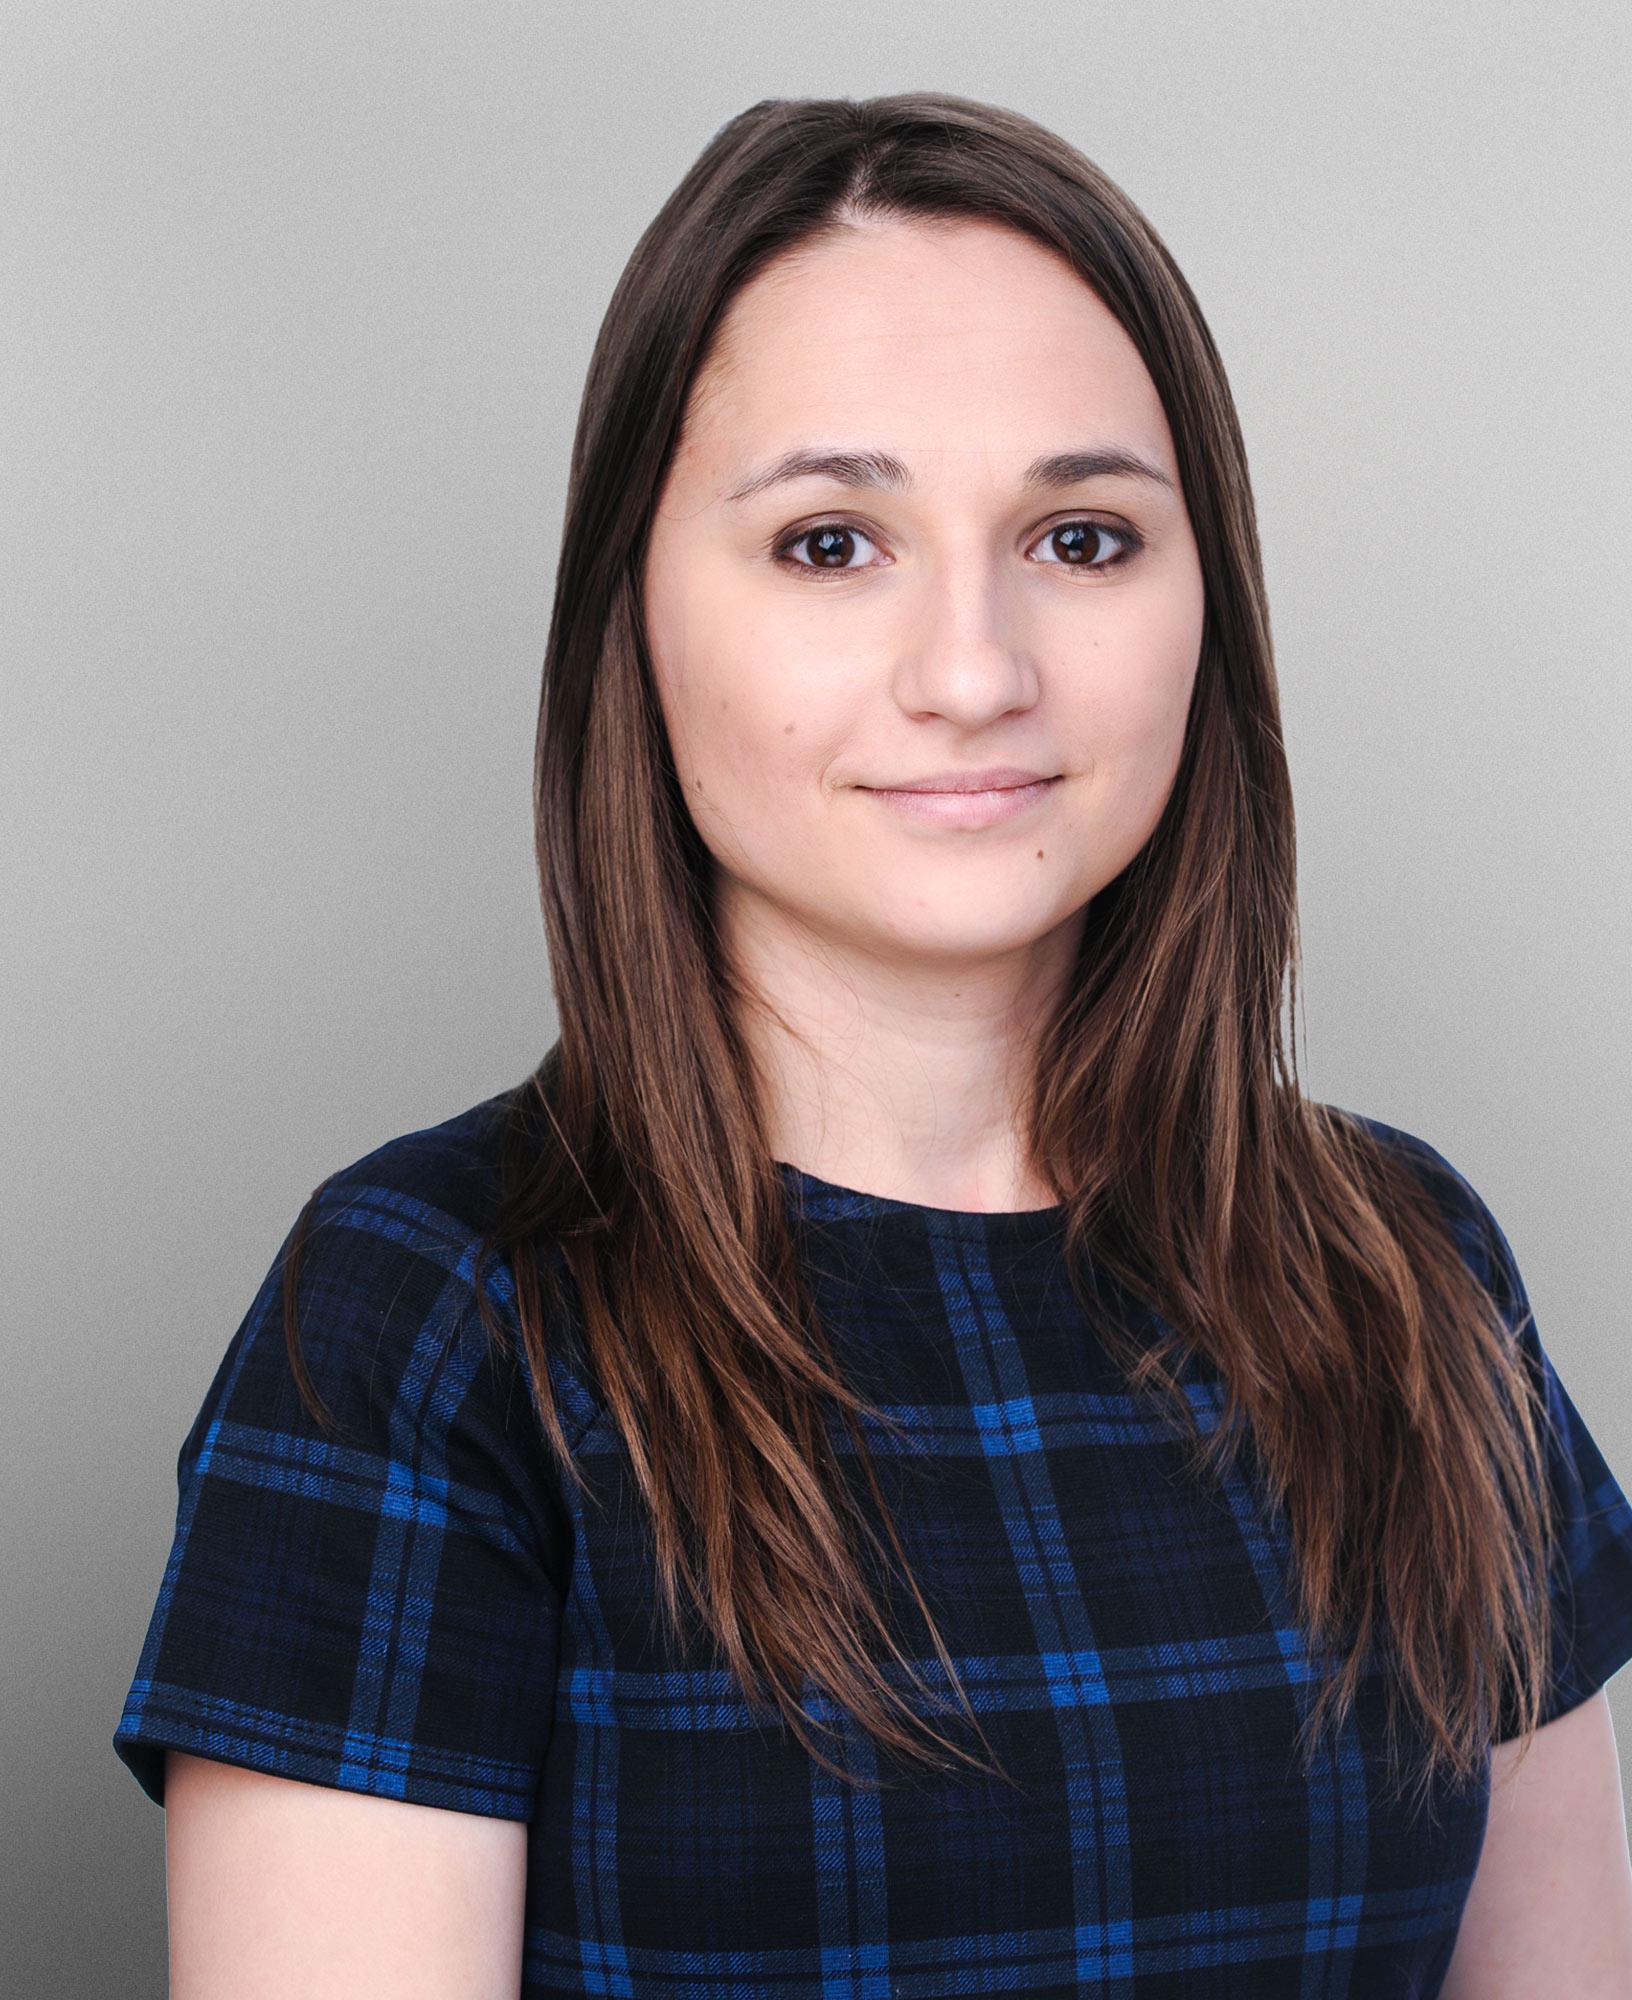 Ioana Herciu